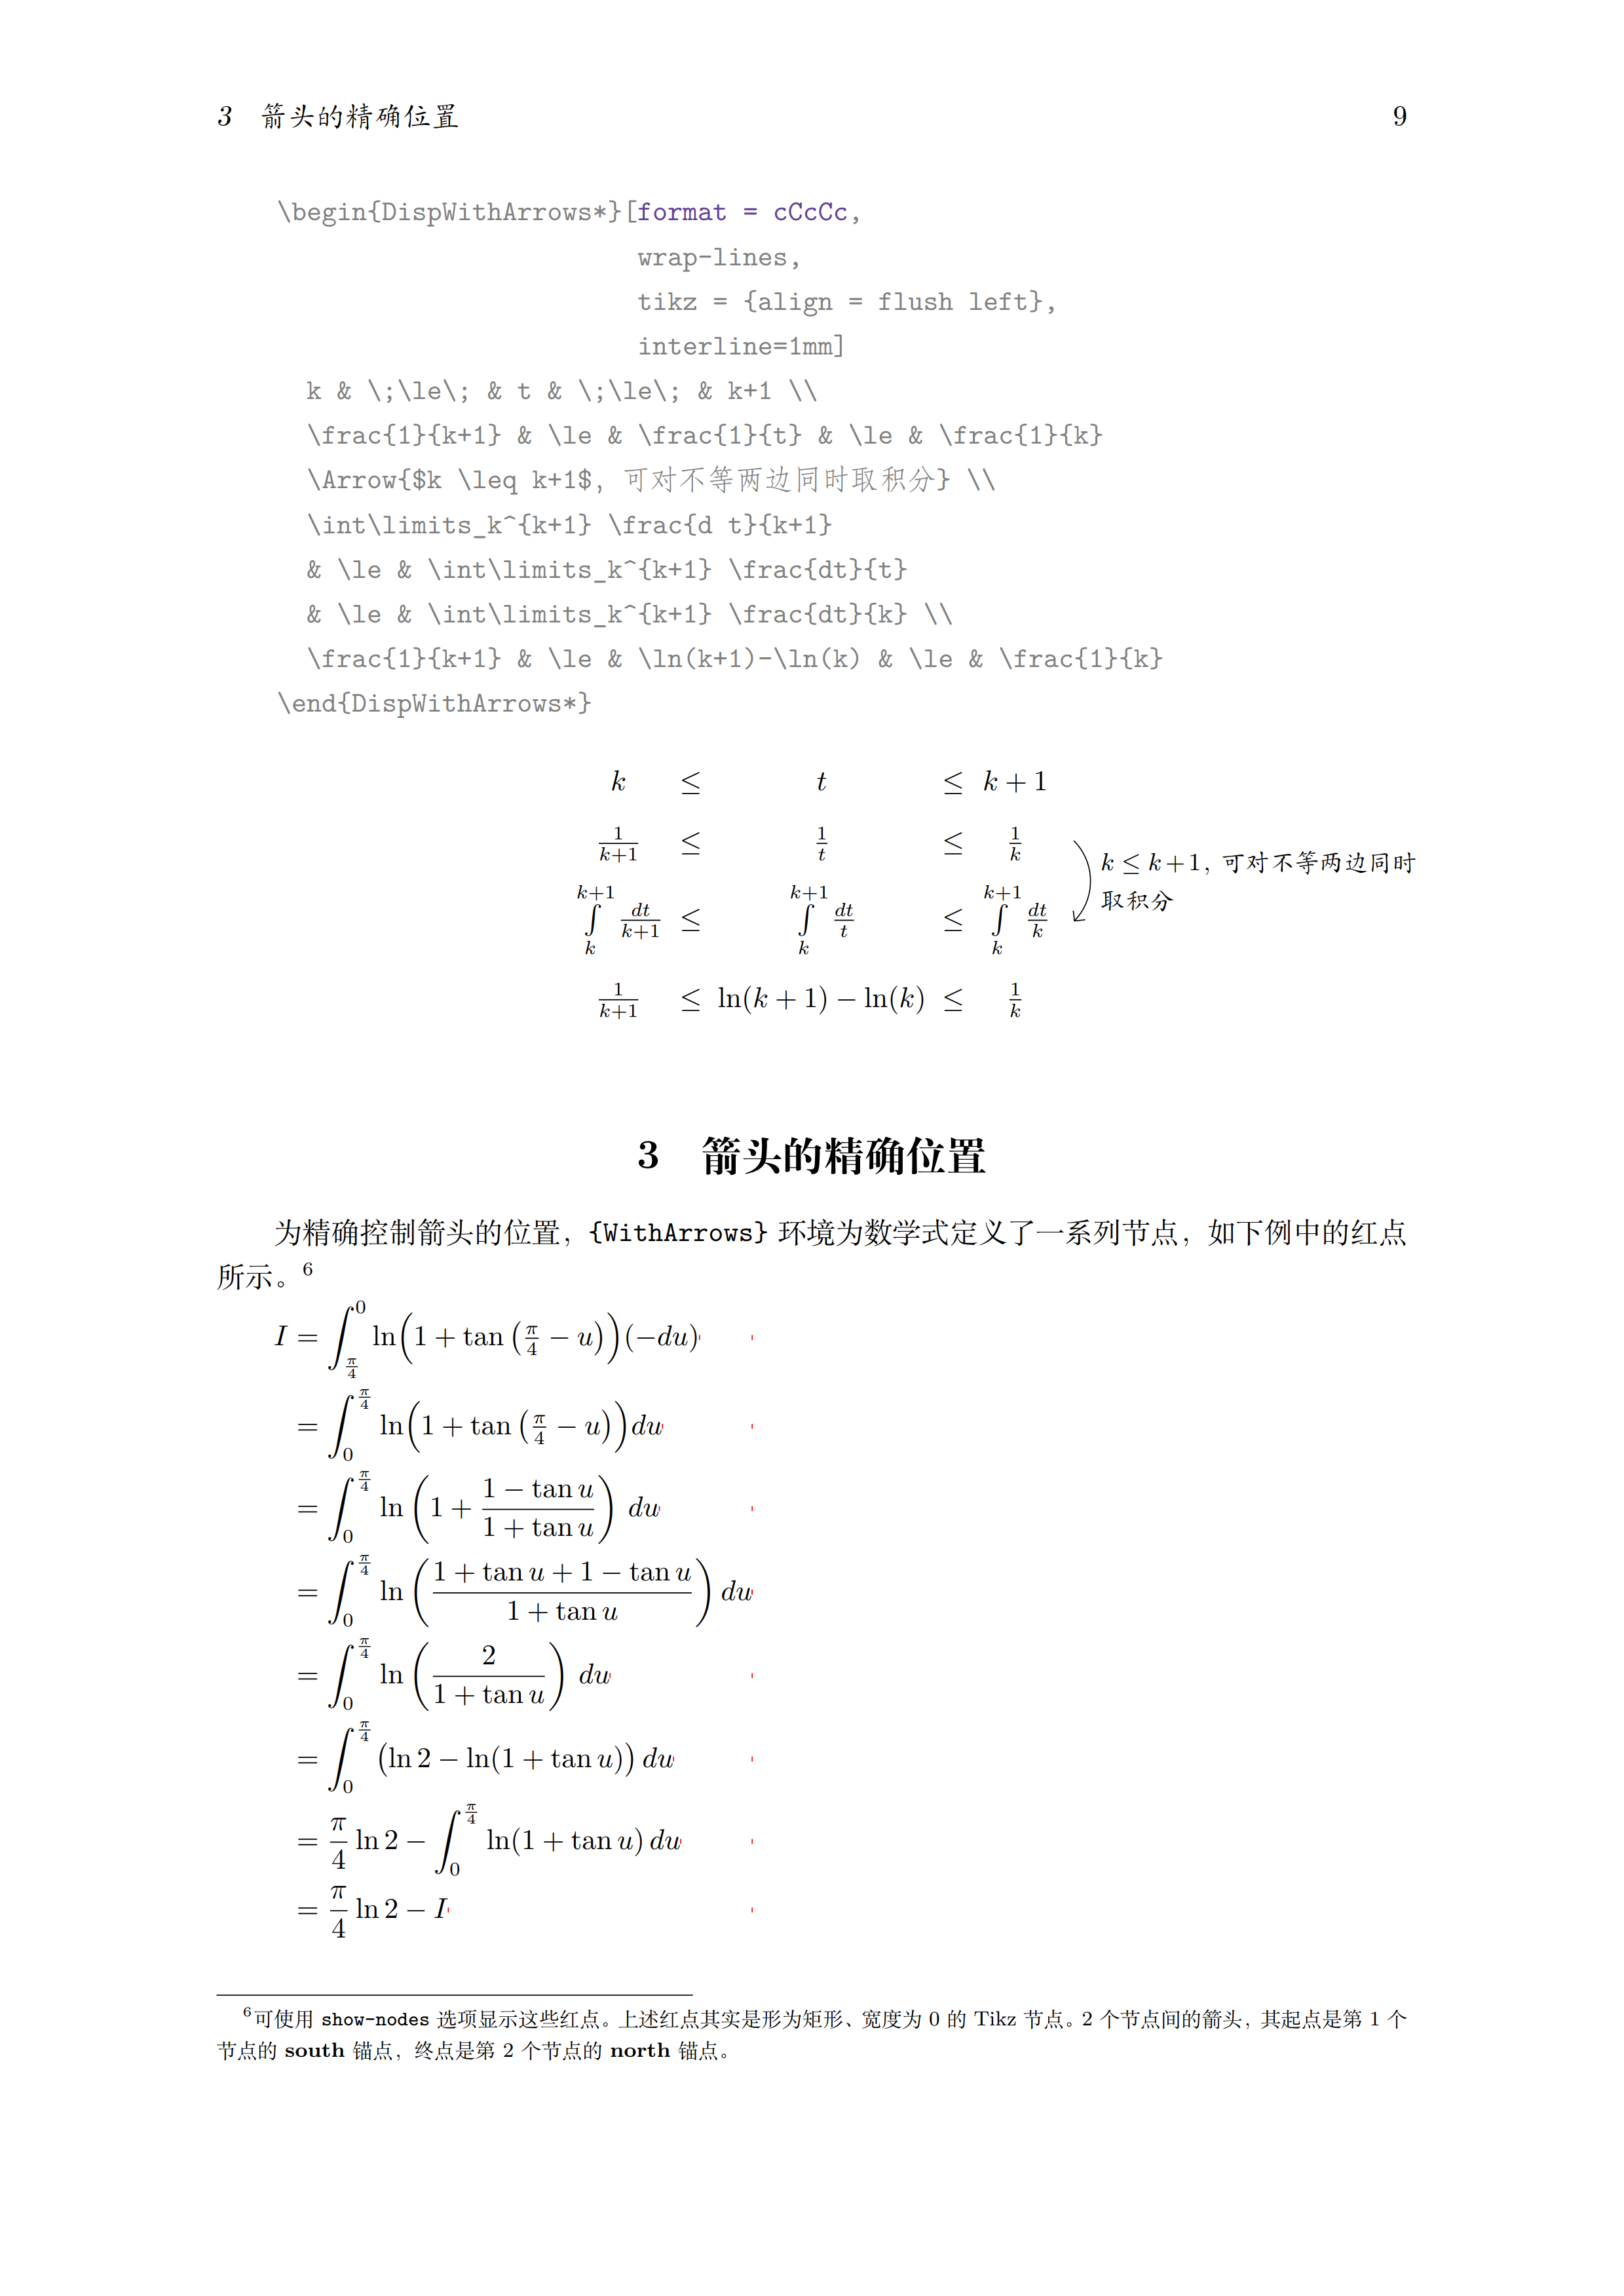 witharrows 宏包手册(中译版)